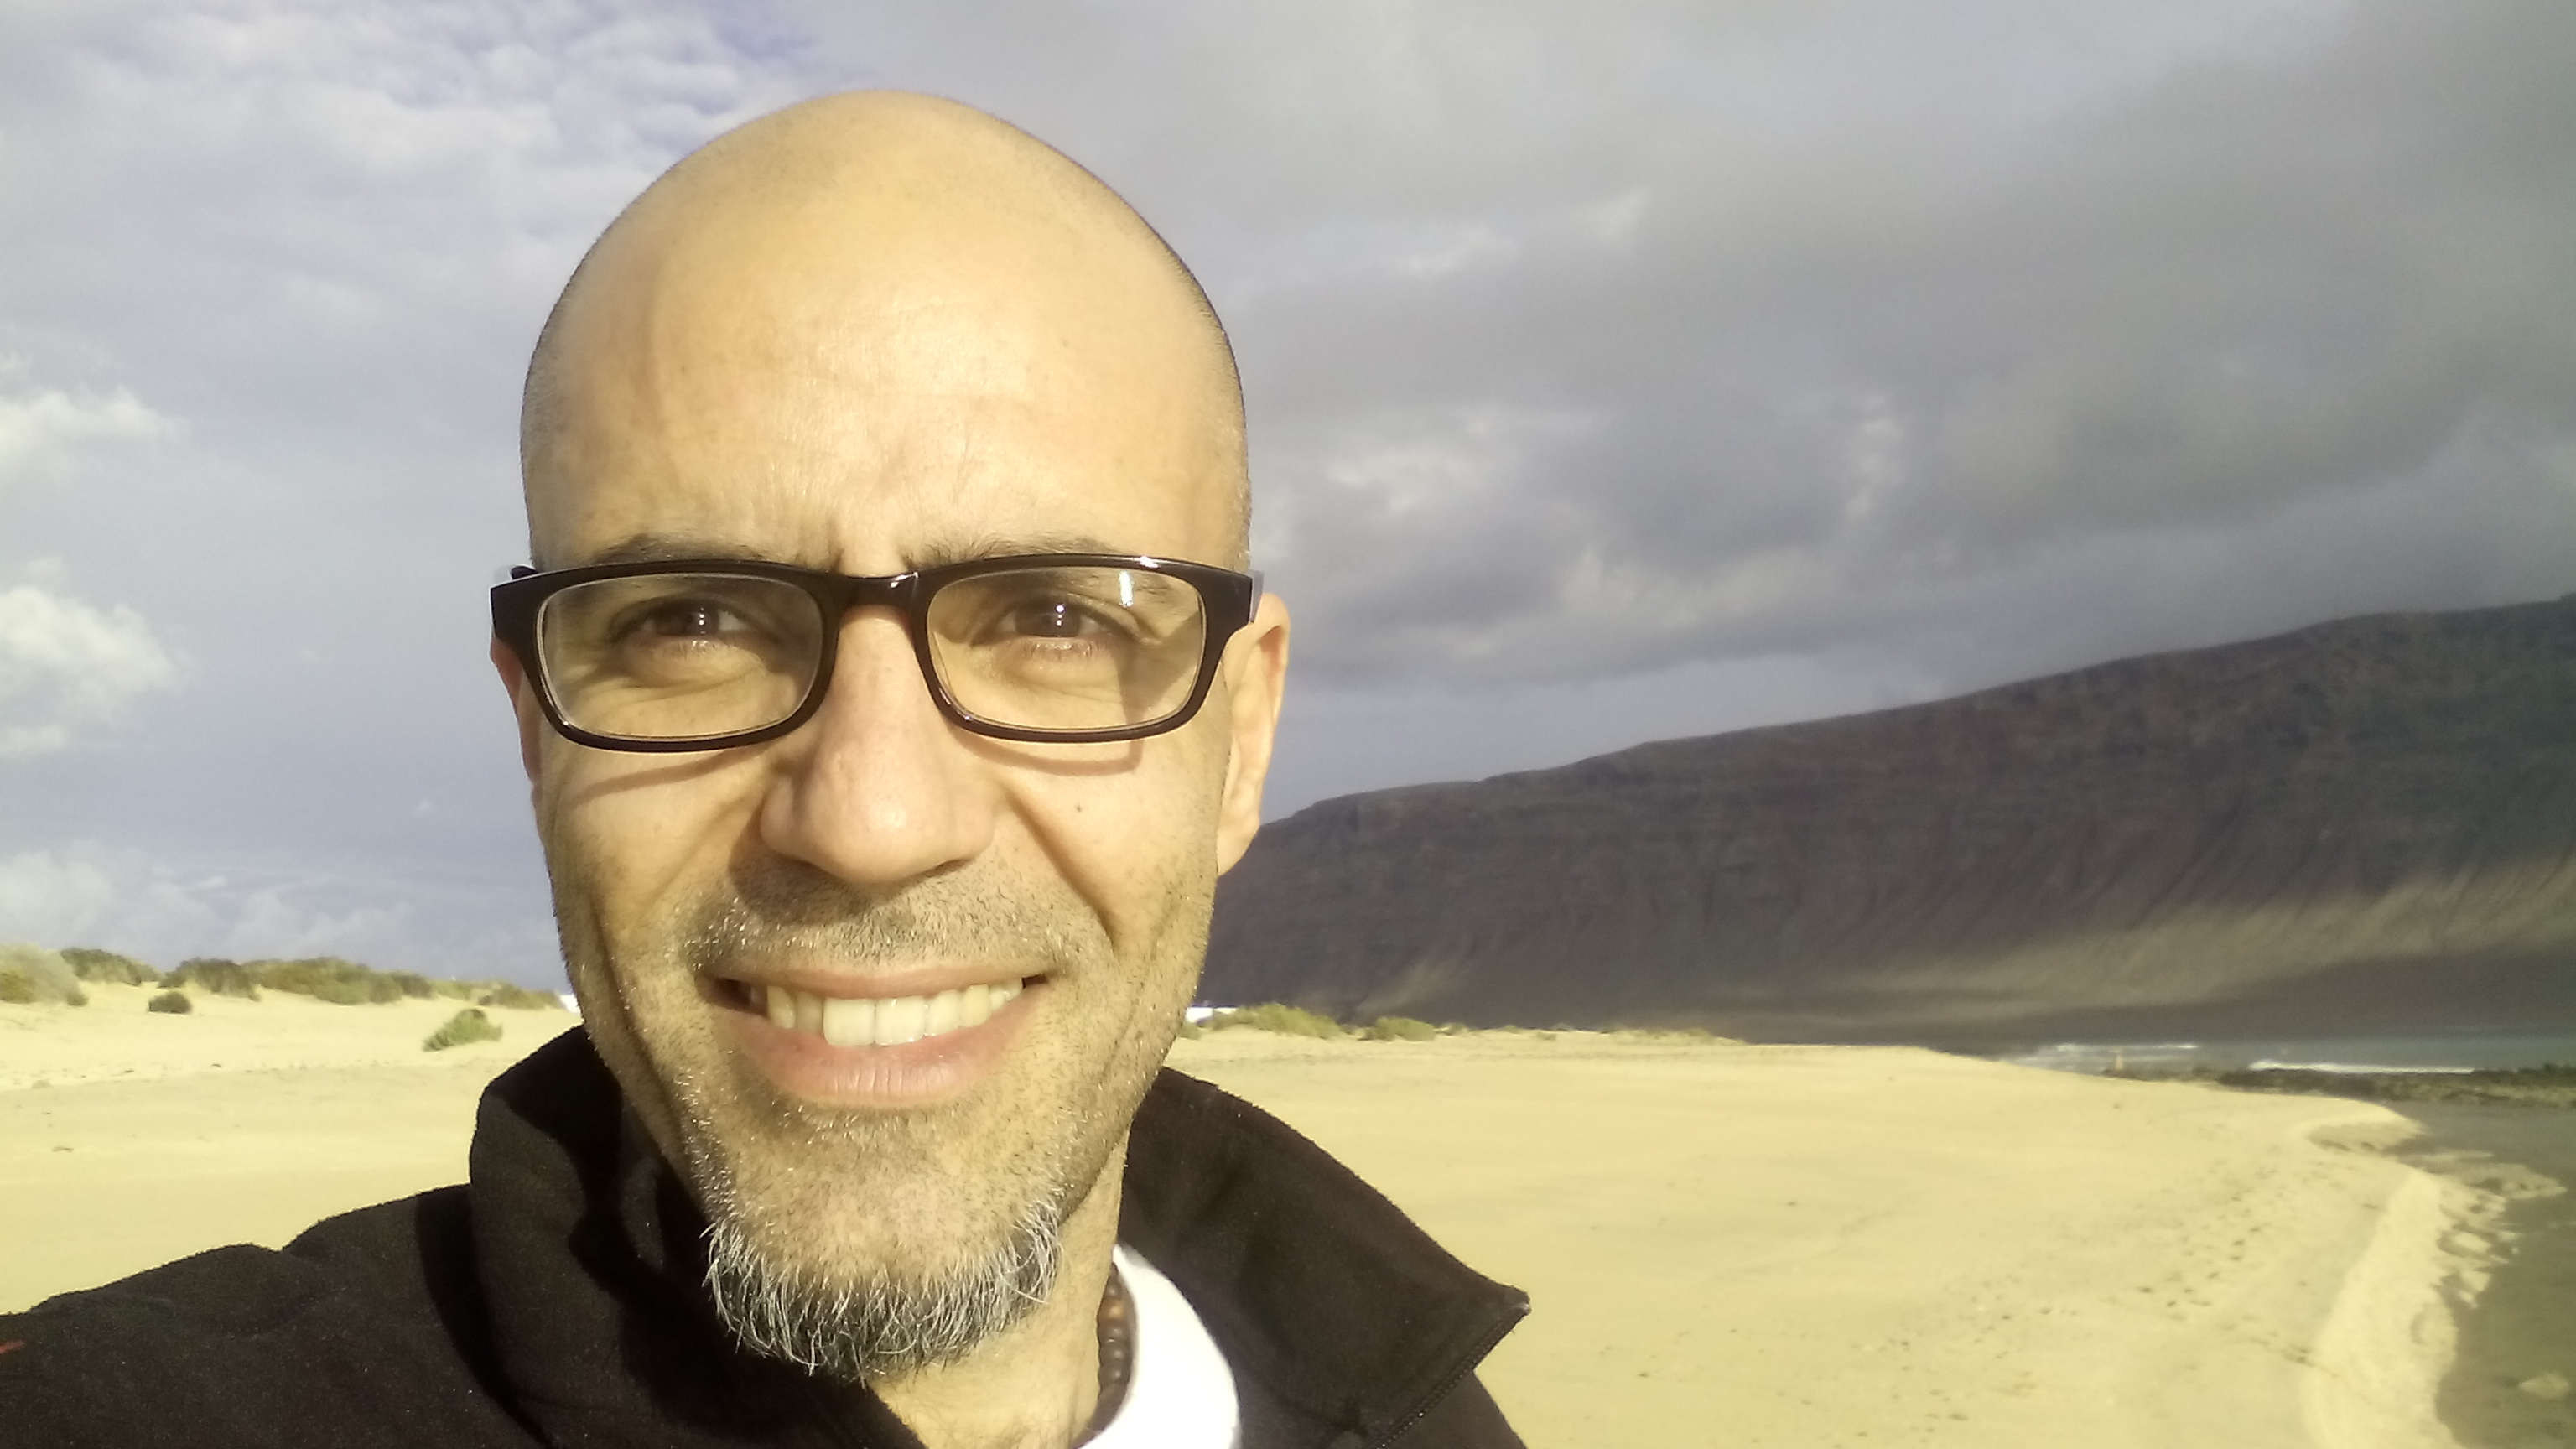 Jorge Romero Cabrera